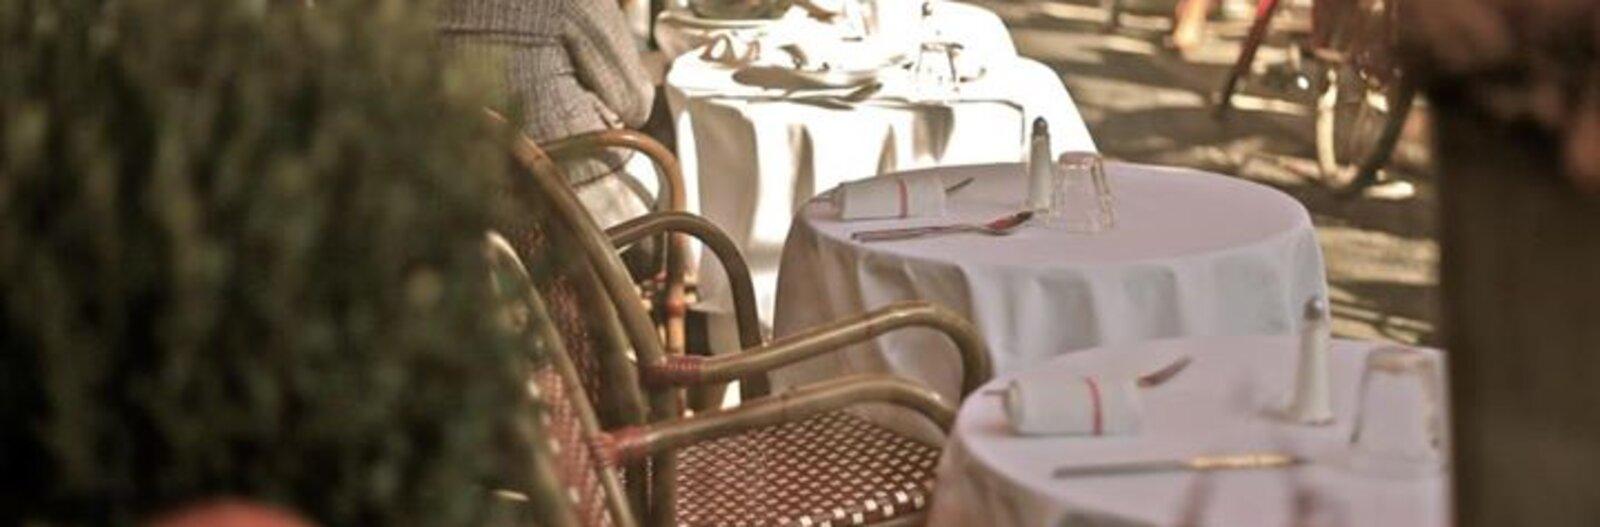 Budapest legromantikusabb éttermei